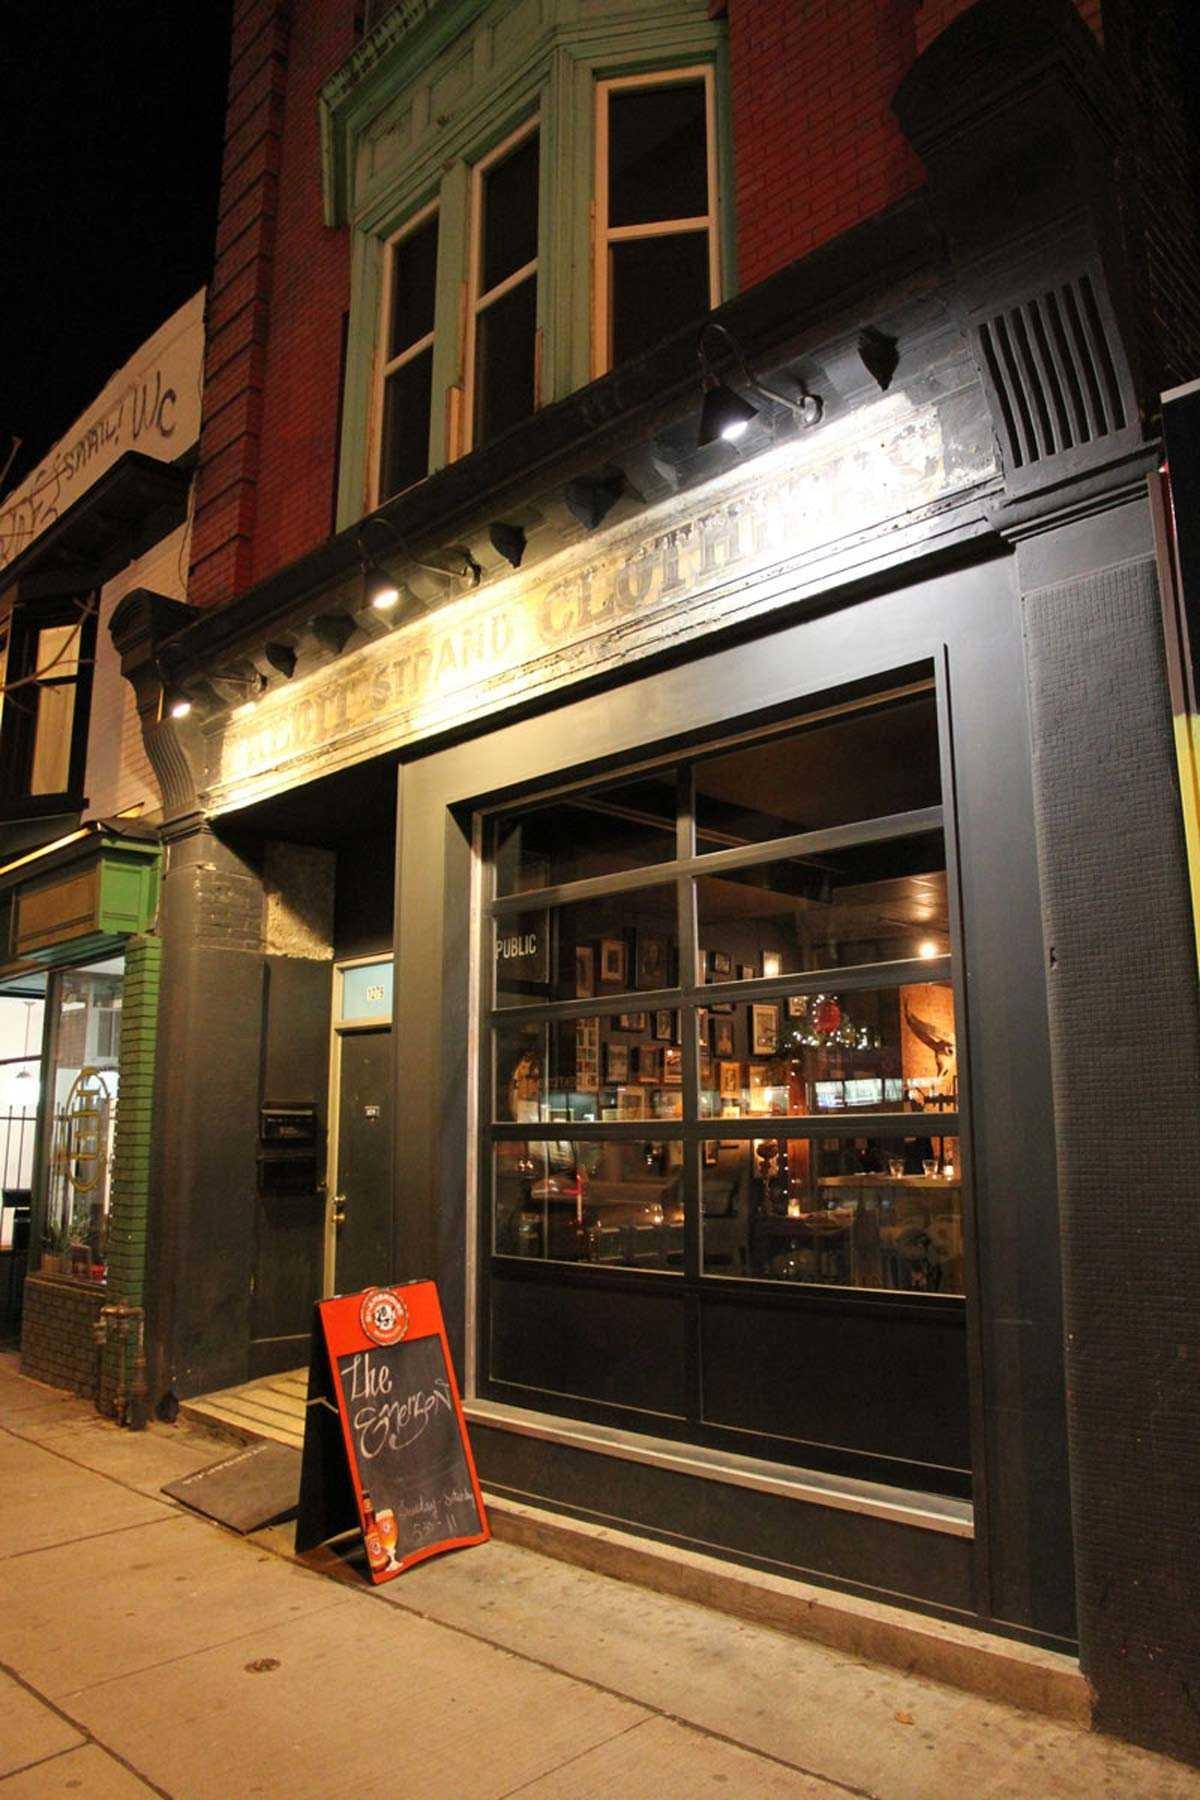 The Emerson Restaurant